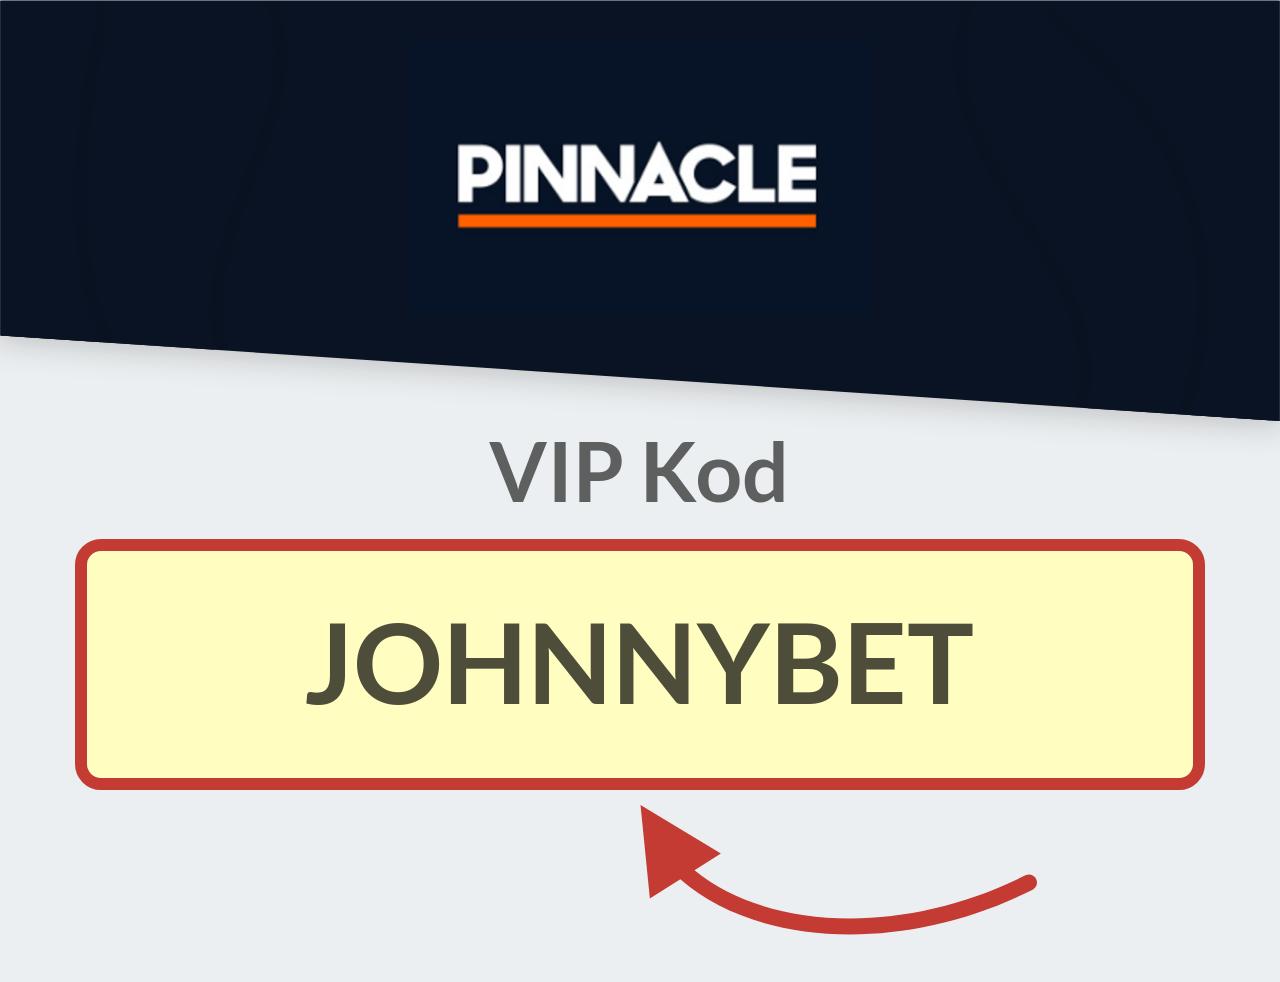 Pinnacle VIP Kod